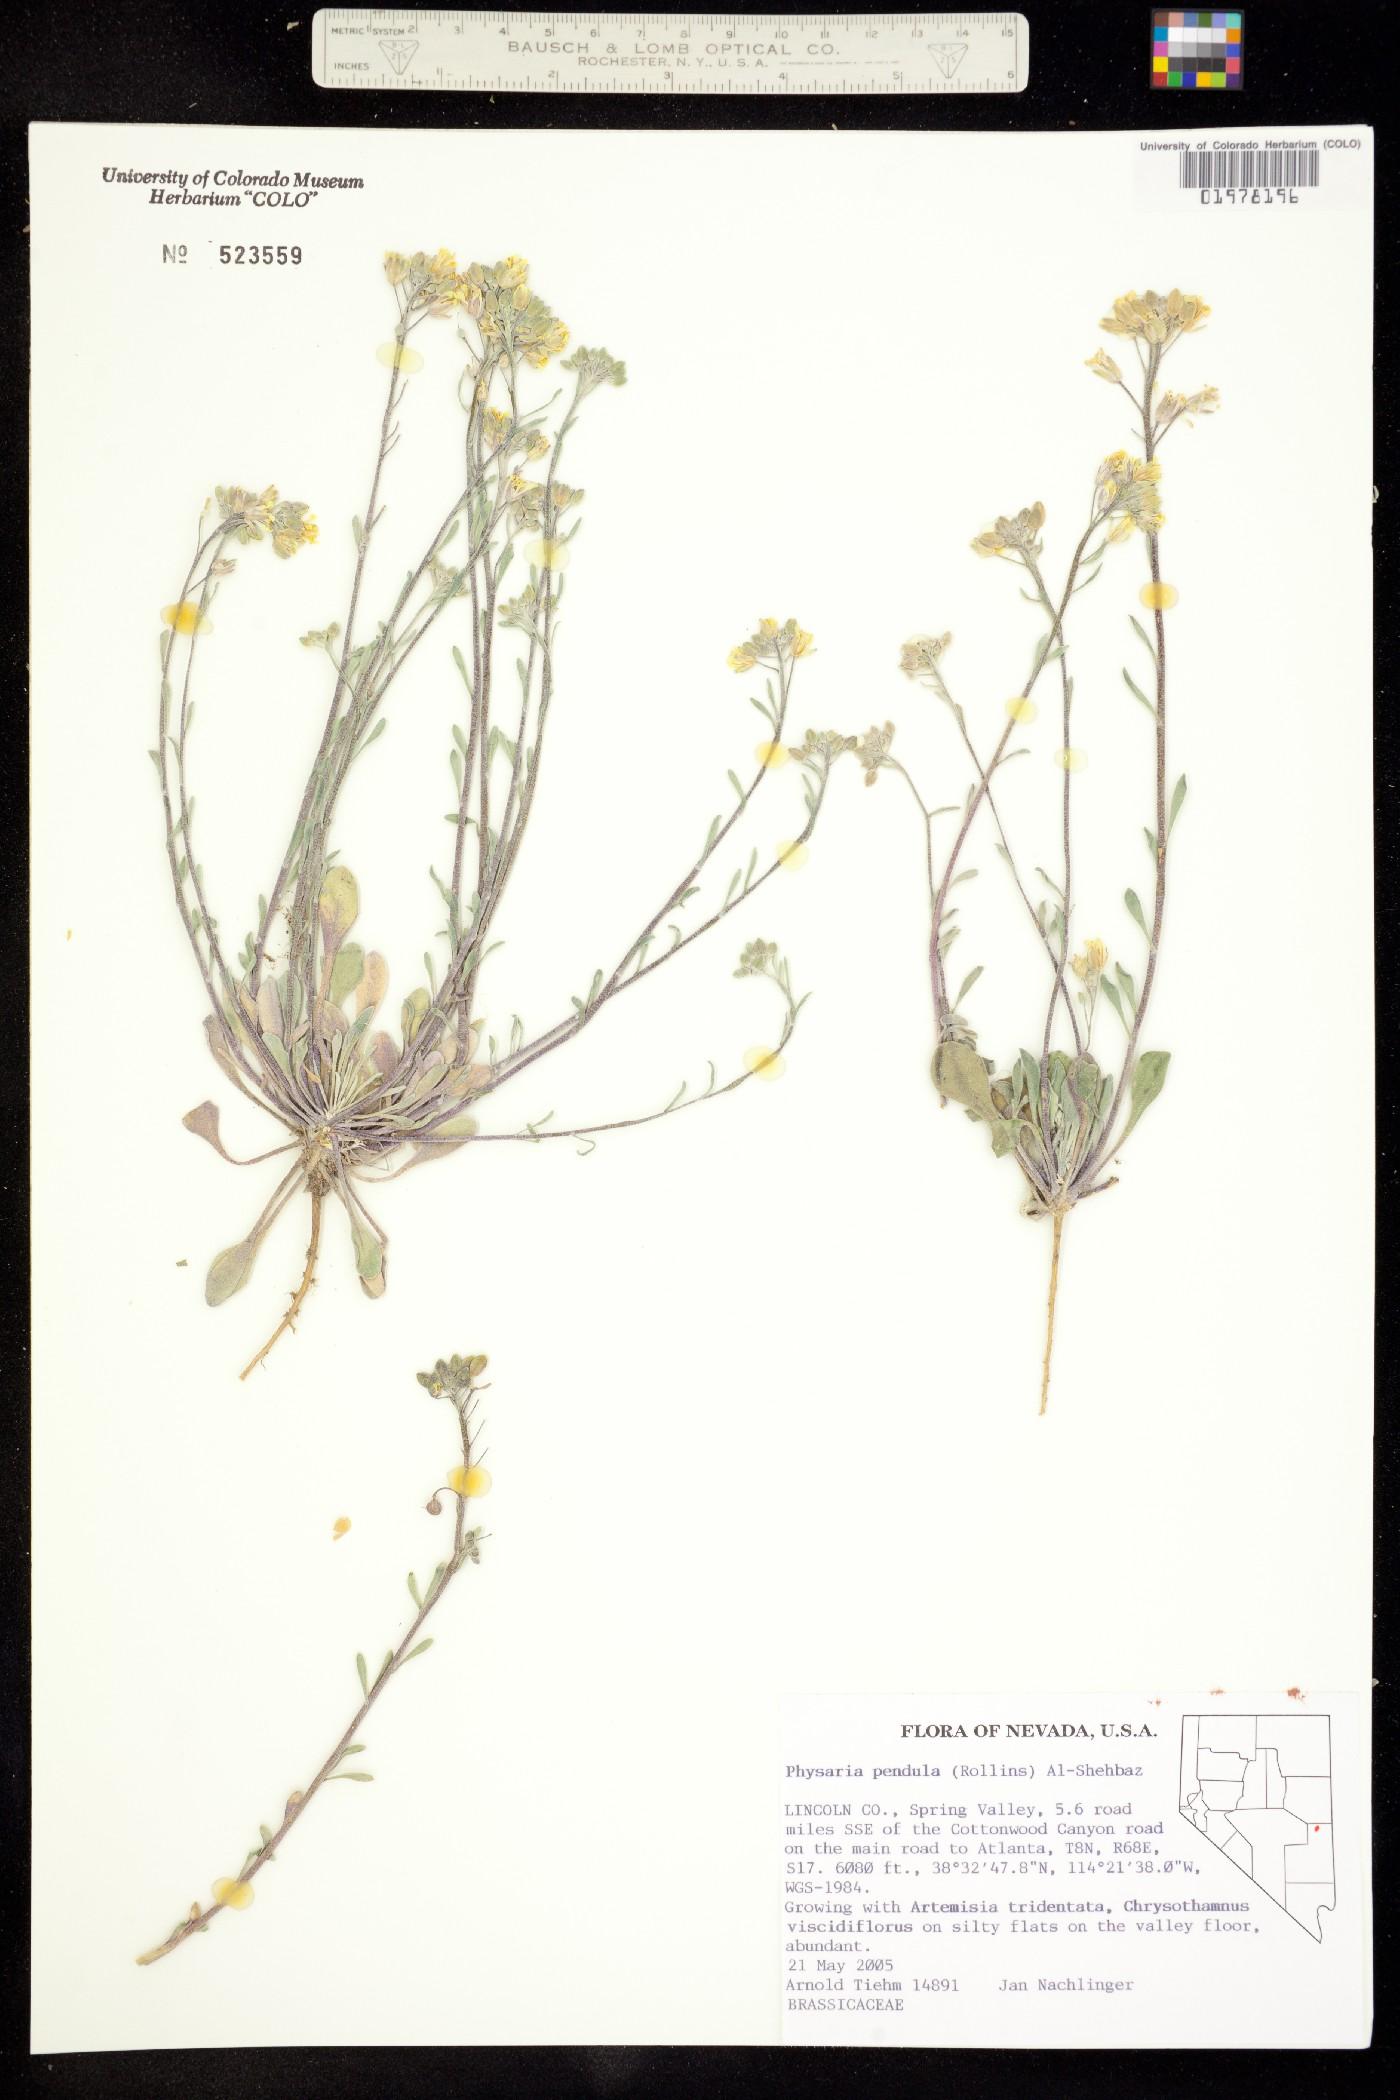 Physaria pendula image